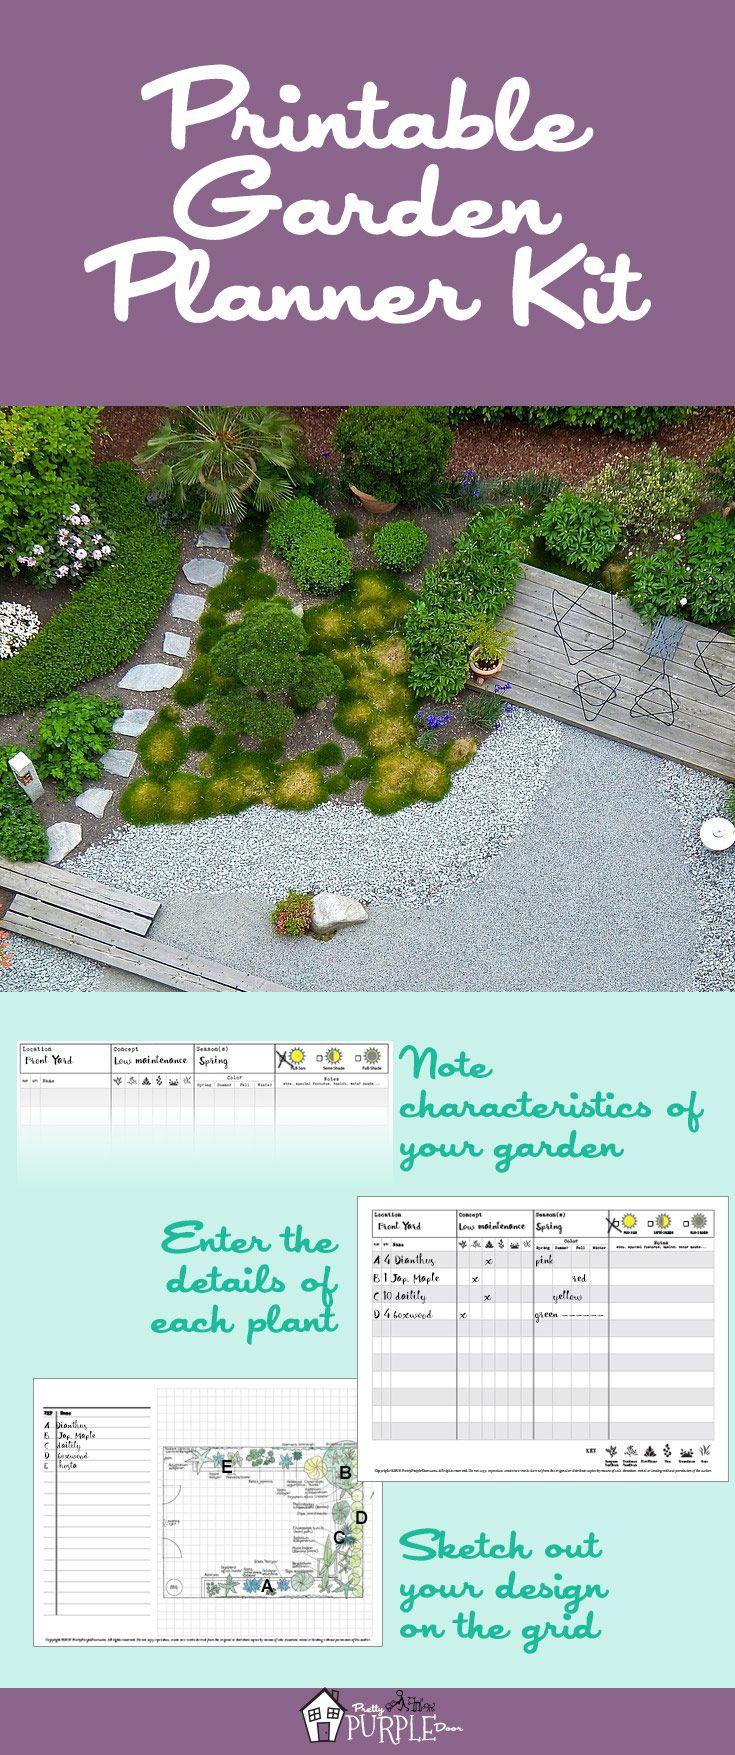 Printable Garden Planner Kit With Images Garden Planner